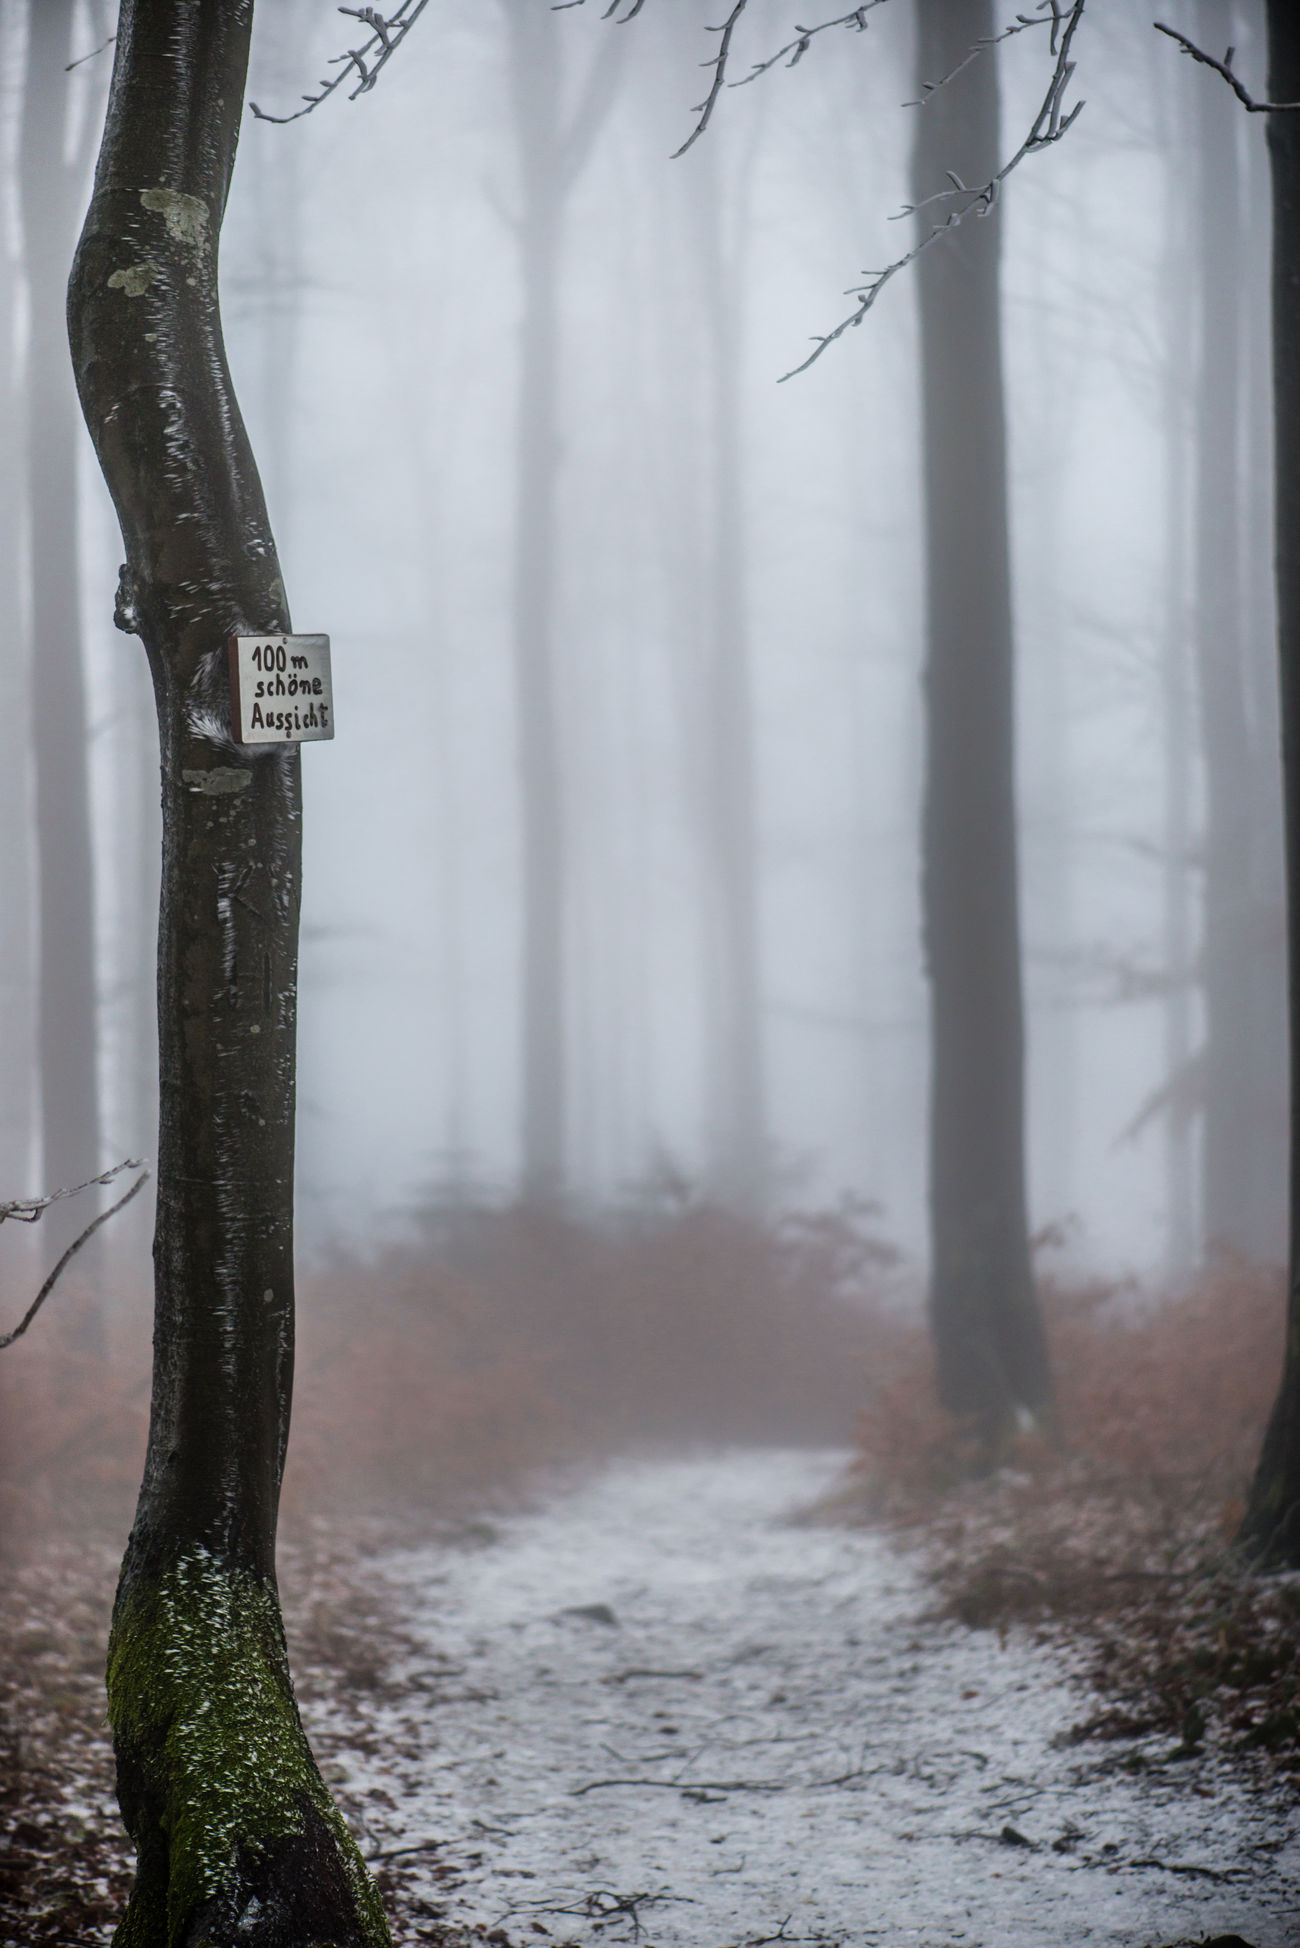 100m nice view Foggy Weather Hiking Trees